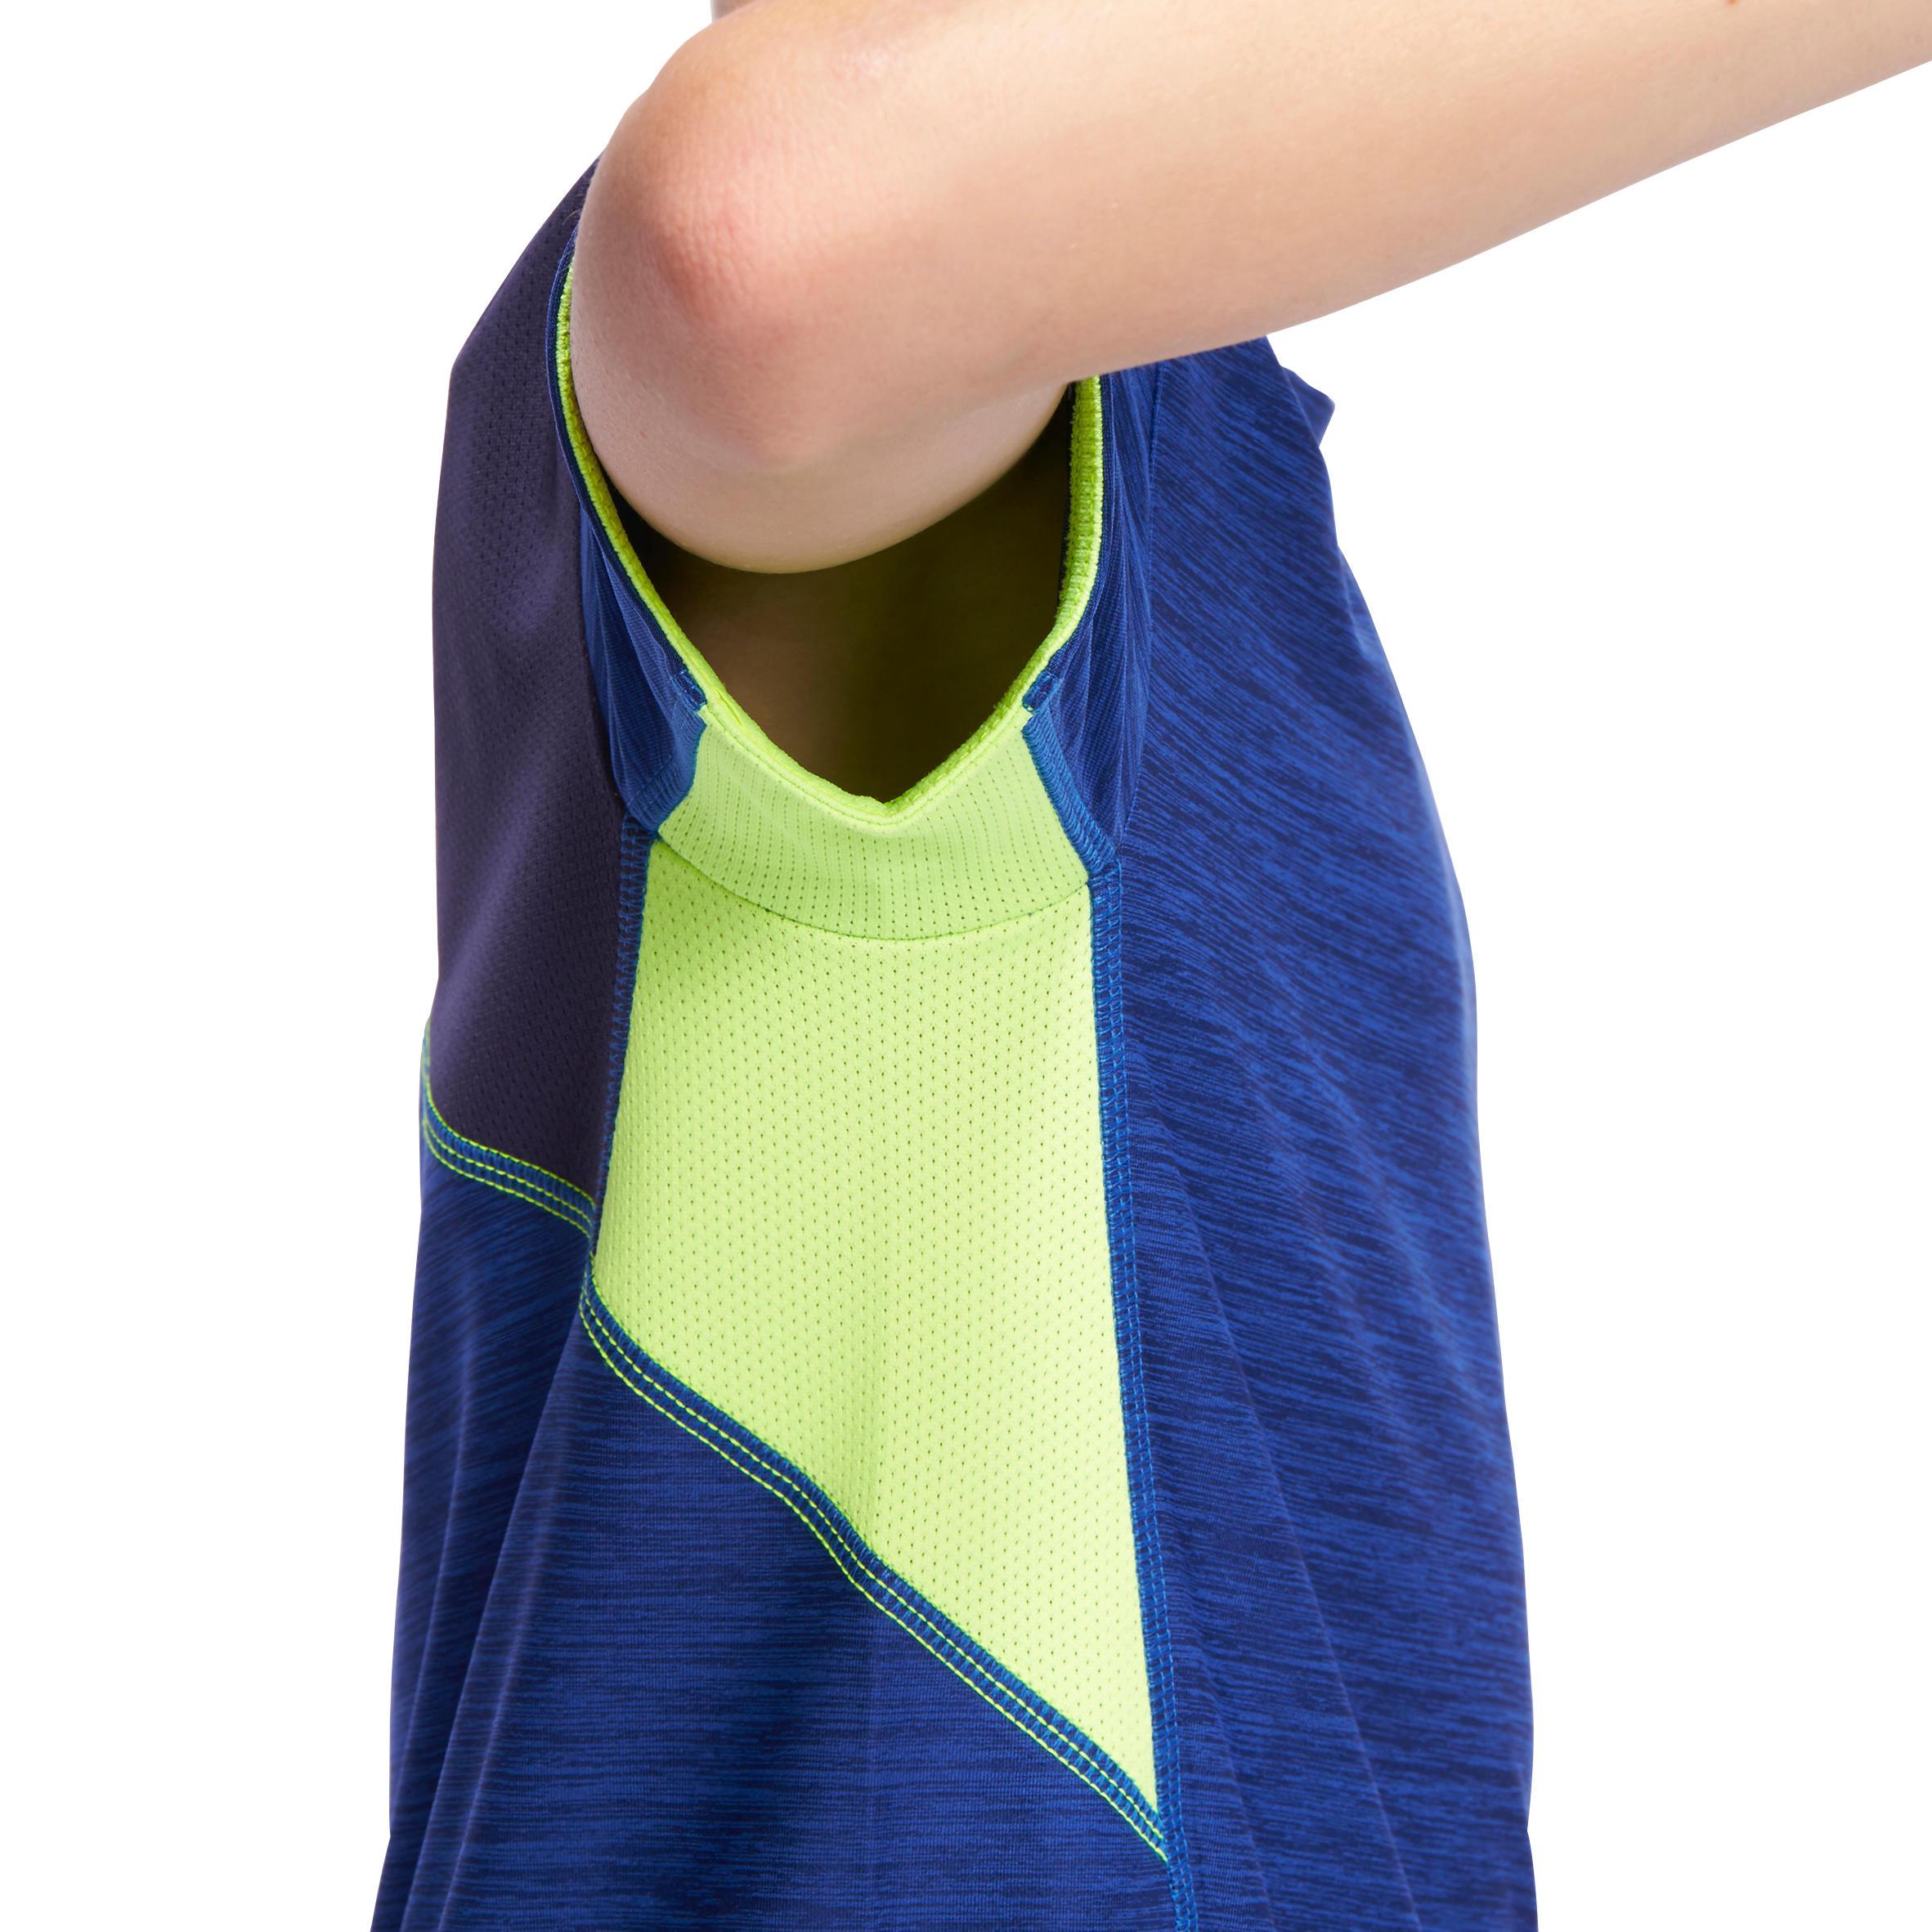 Energy Boys' Short-Sleeved Gym T-Shirt - Blue/Yellow